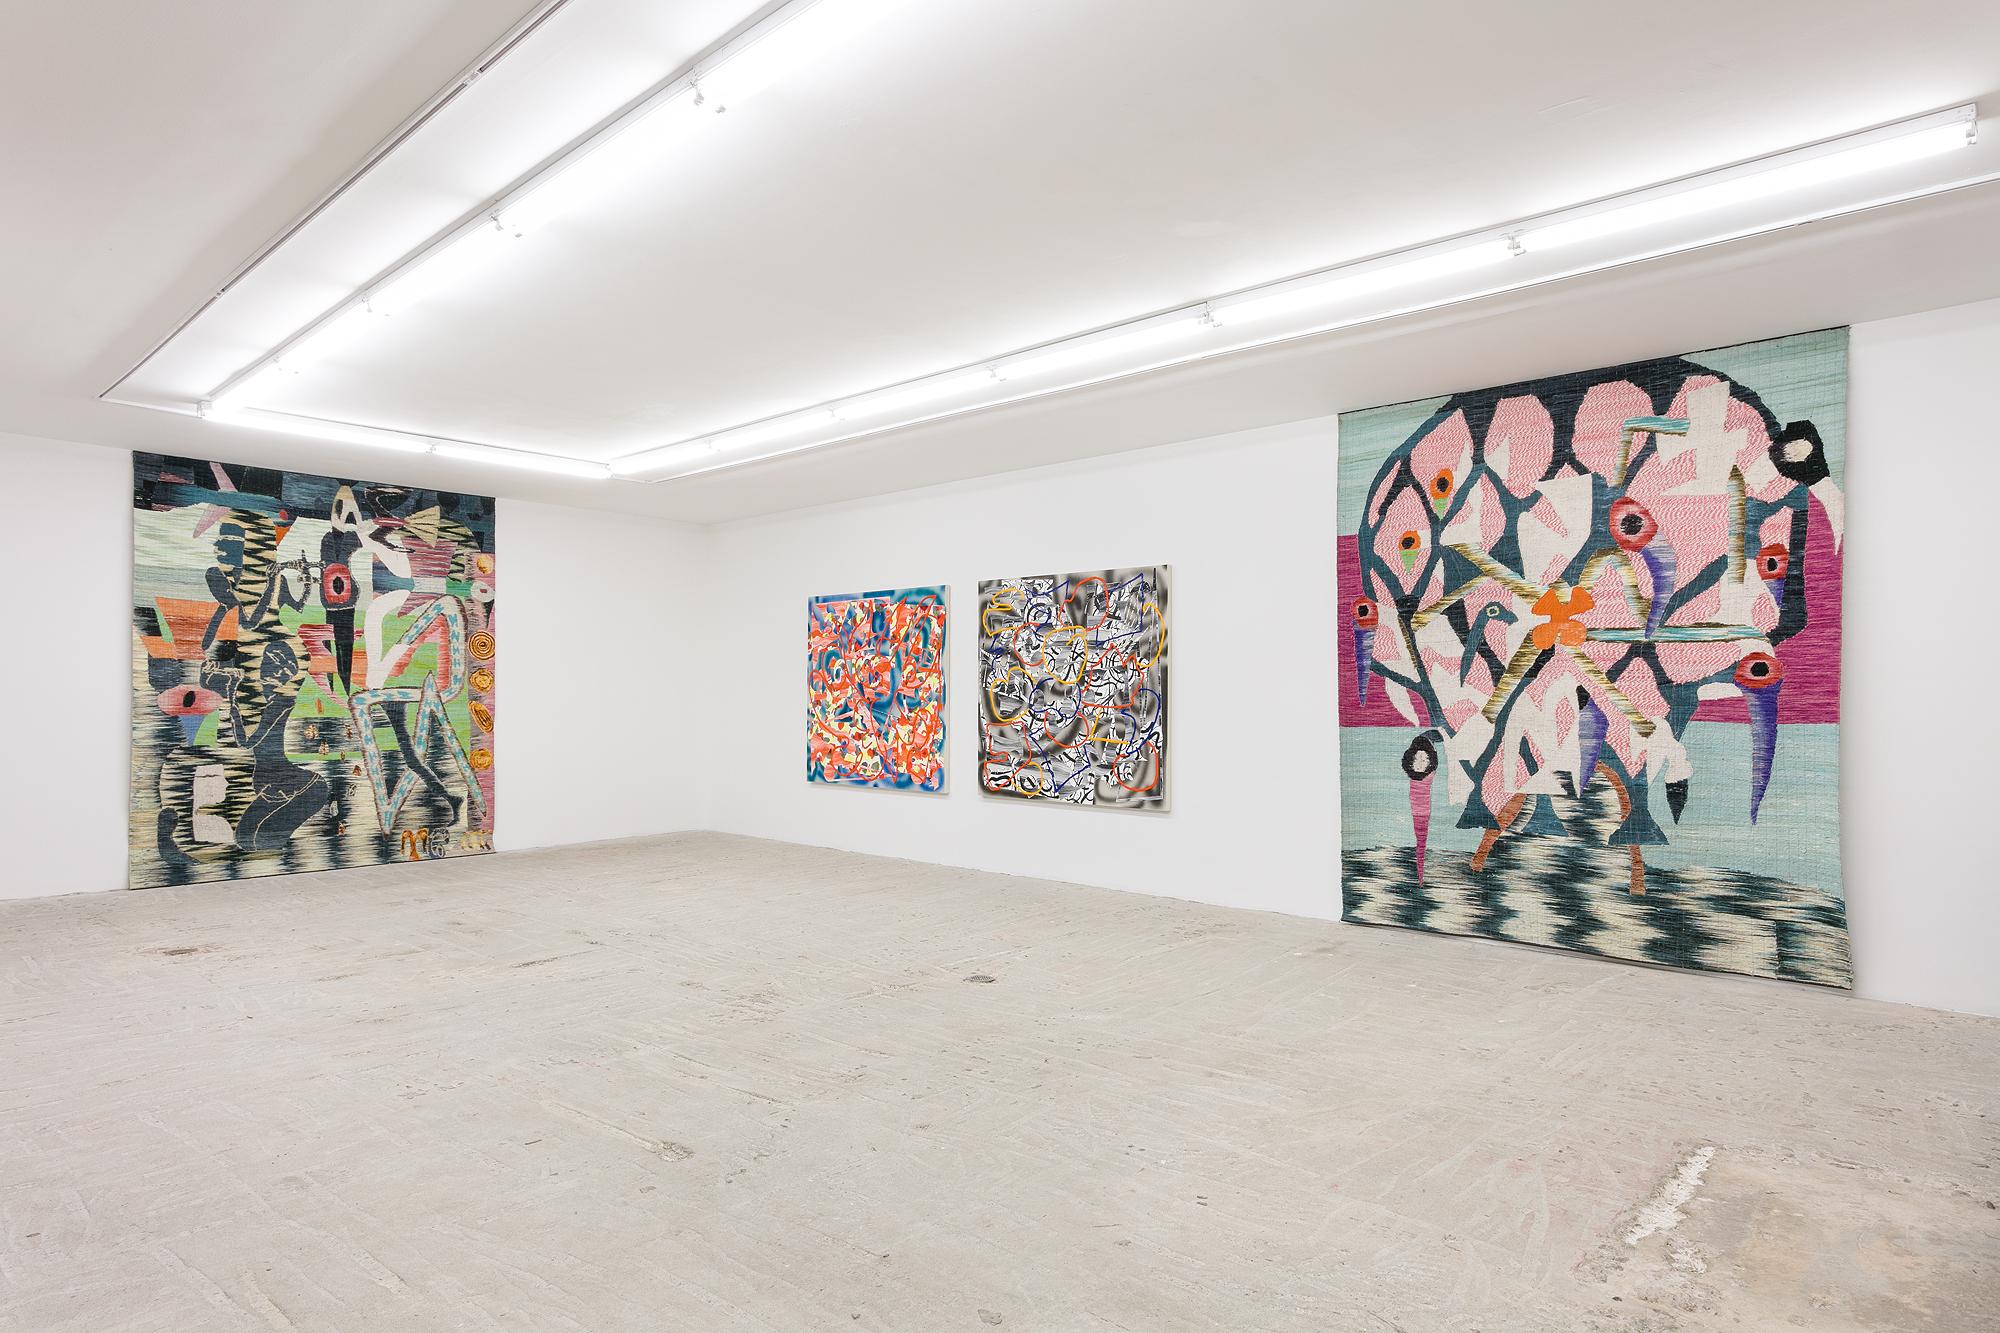 Trudy Benson and Yann Gerstberger,  TT52,  Installation View   at Lyles & King, June 8 - July 28, 2017